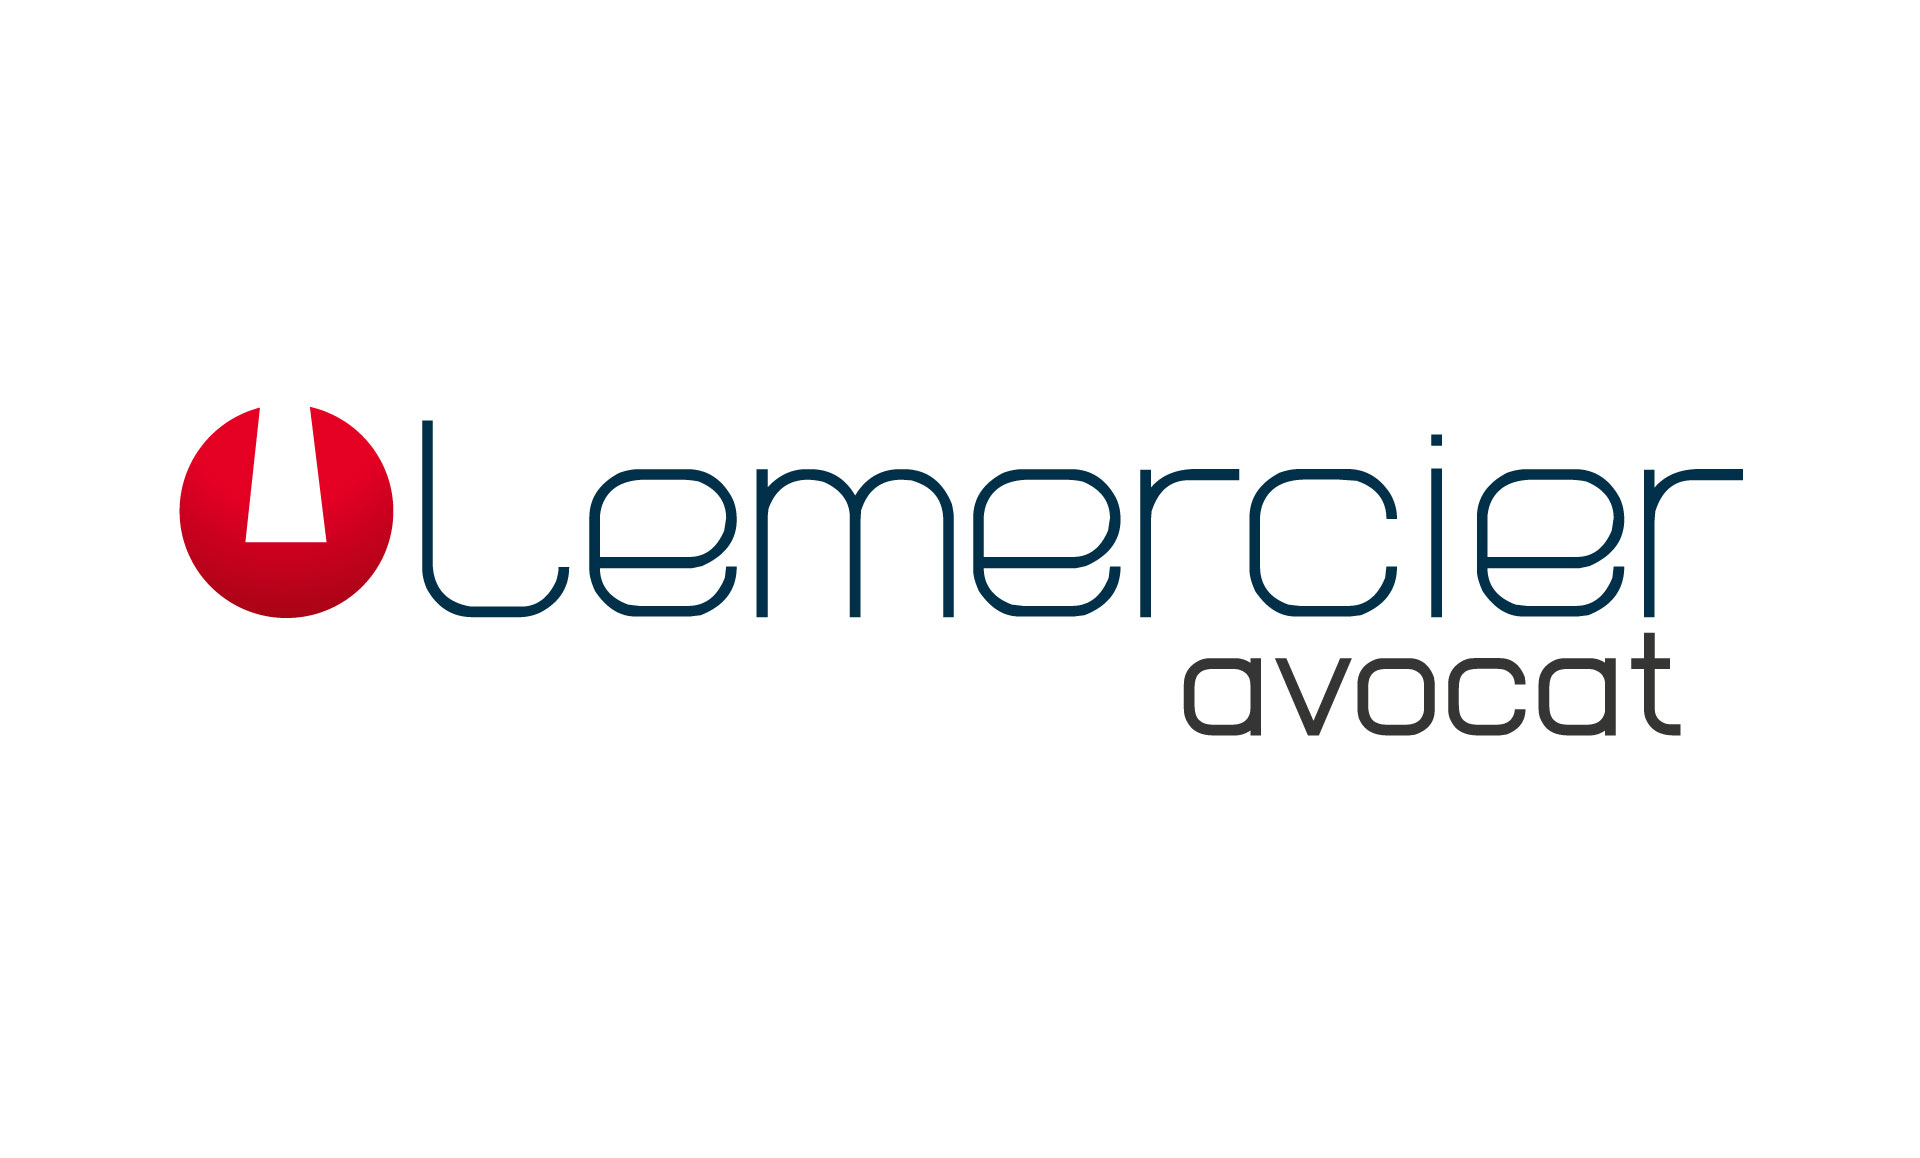 Logo Lemercier Avocat périgueux - Adékoi communication